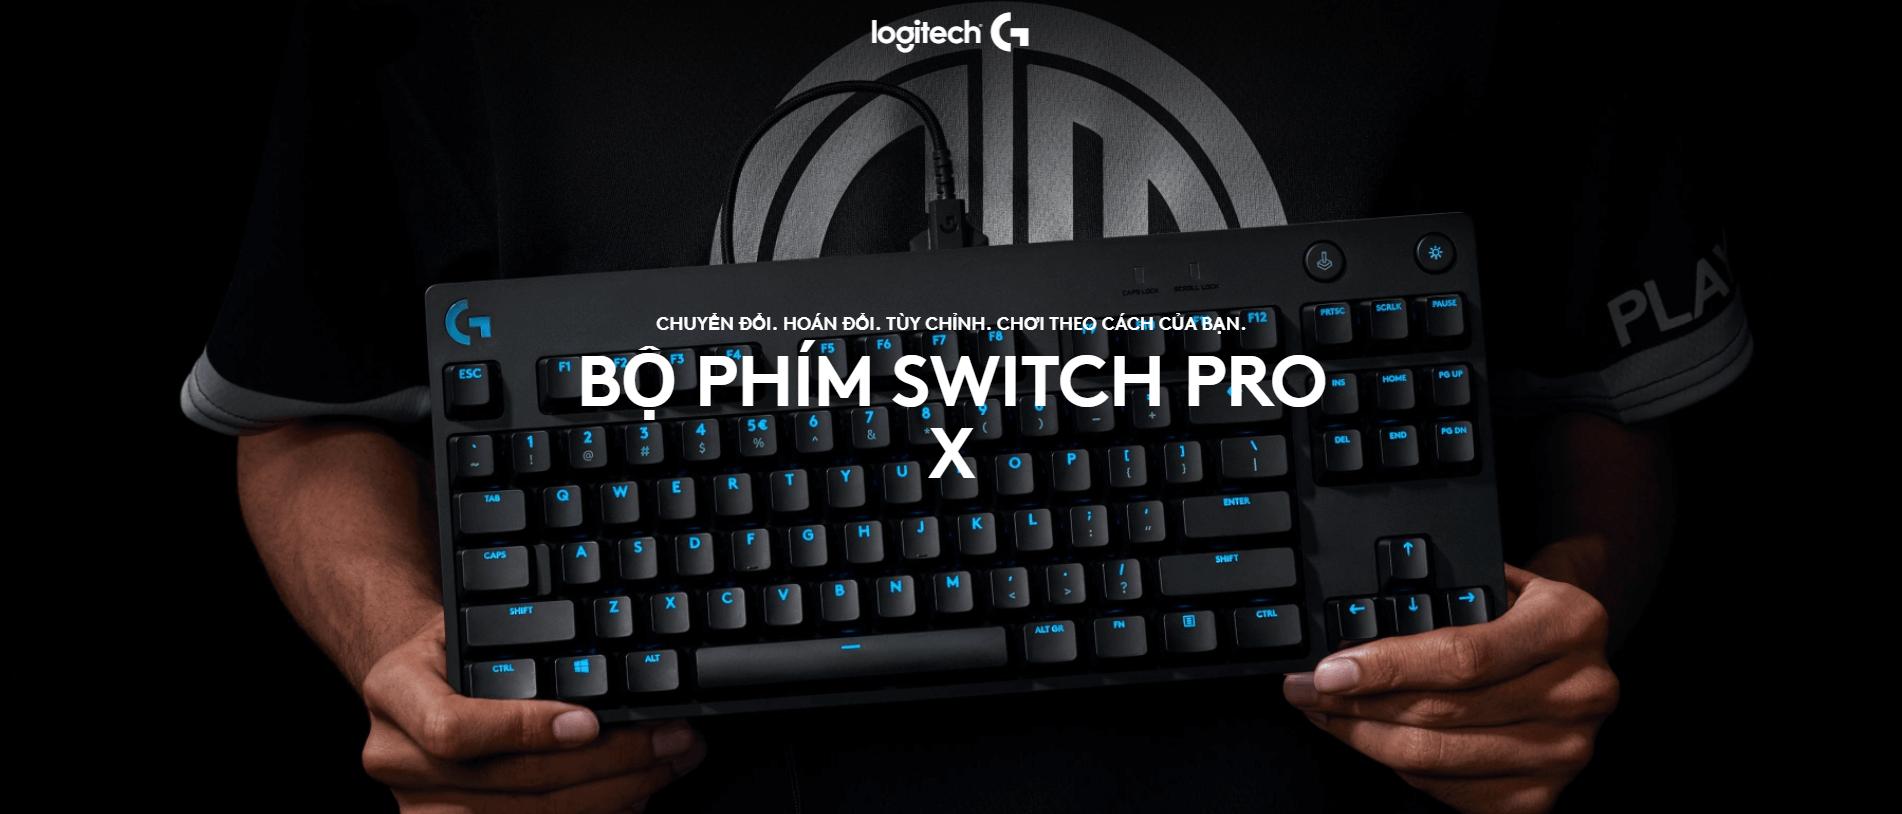 Giới thiệu Bộ switch cho G Pro X Keyboard - GX Brown Tactile RGB switch (943-000326)